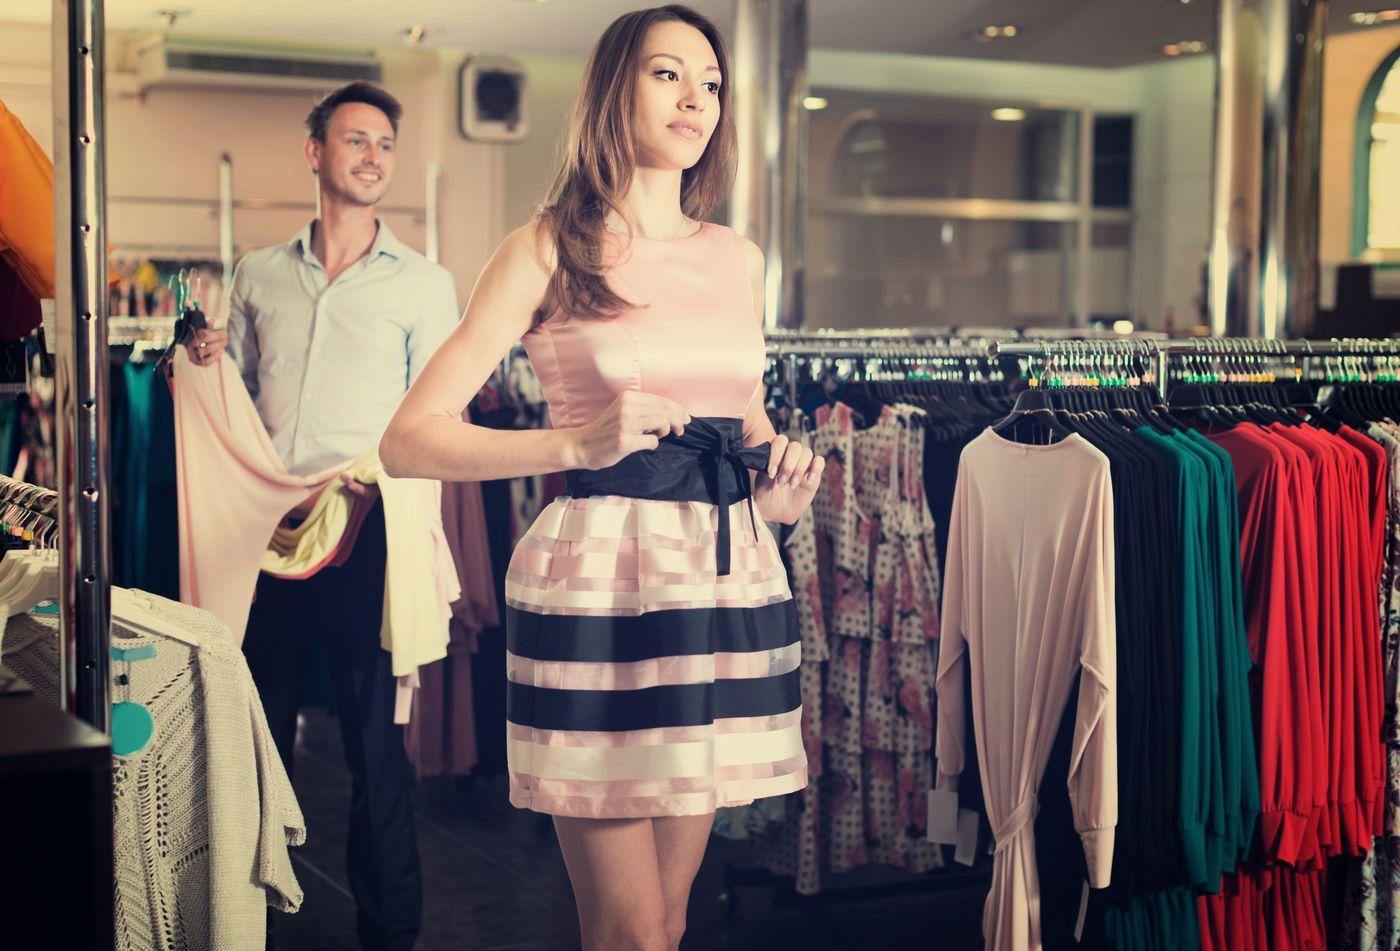 dce3898a30ae9 www.shutterstock.com. まず、花嫁以外が白のドレス ...